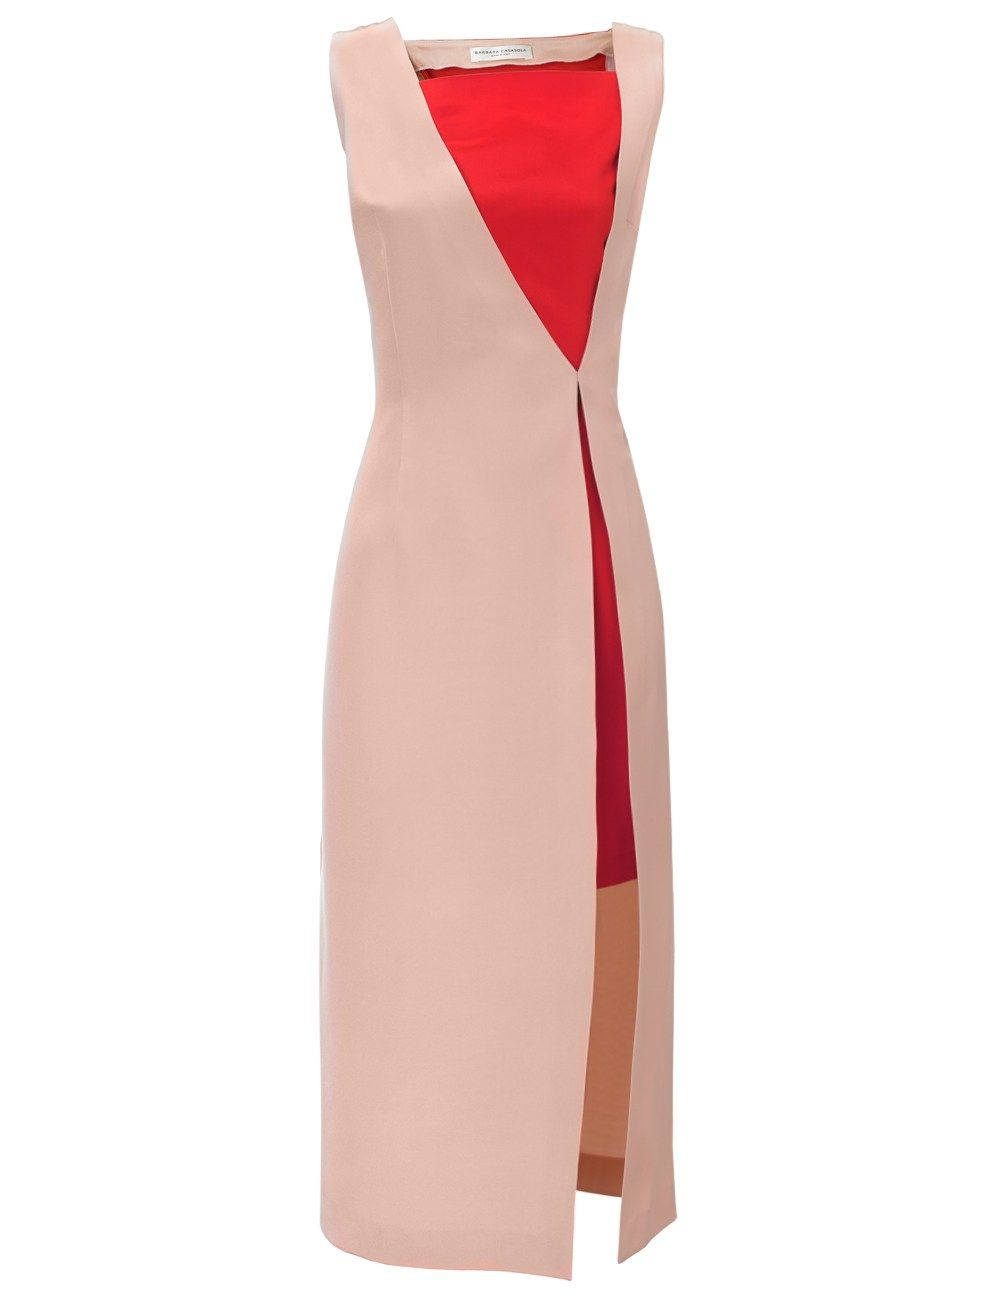 Two Tone Cady Slit Dress | Barbara Casasola | Avenue32 | My style ...